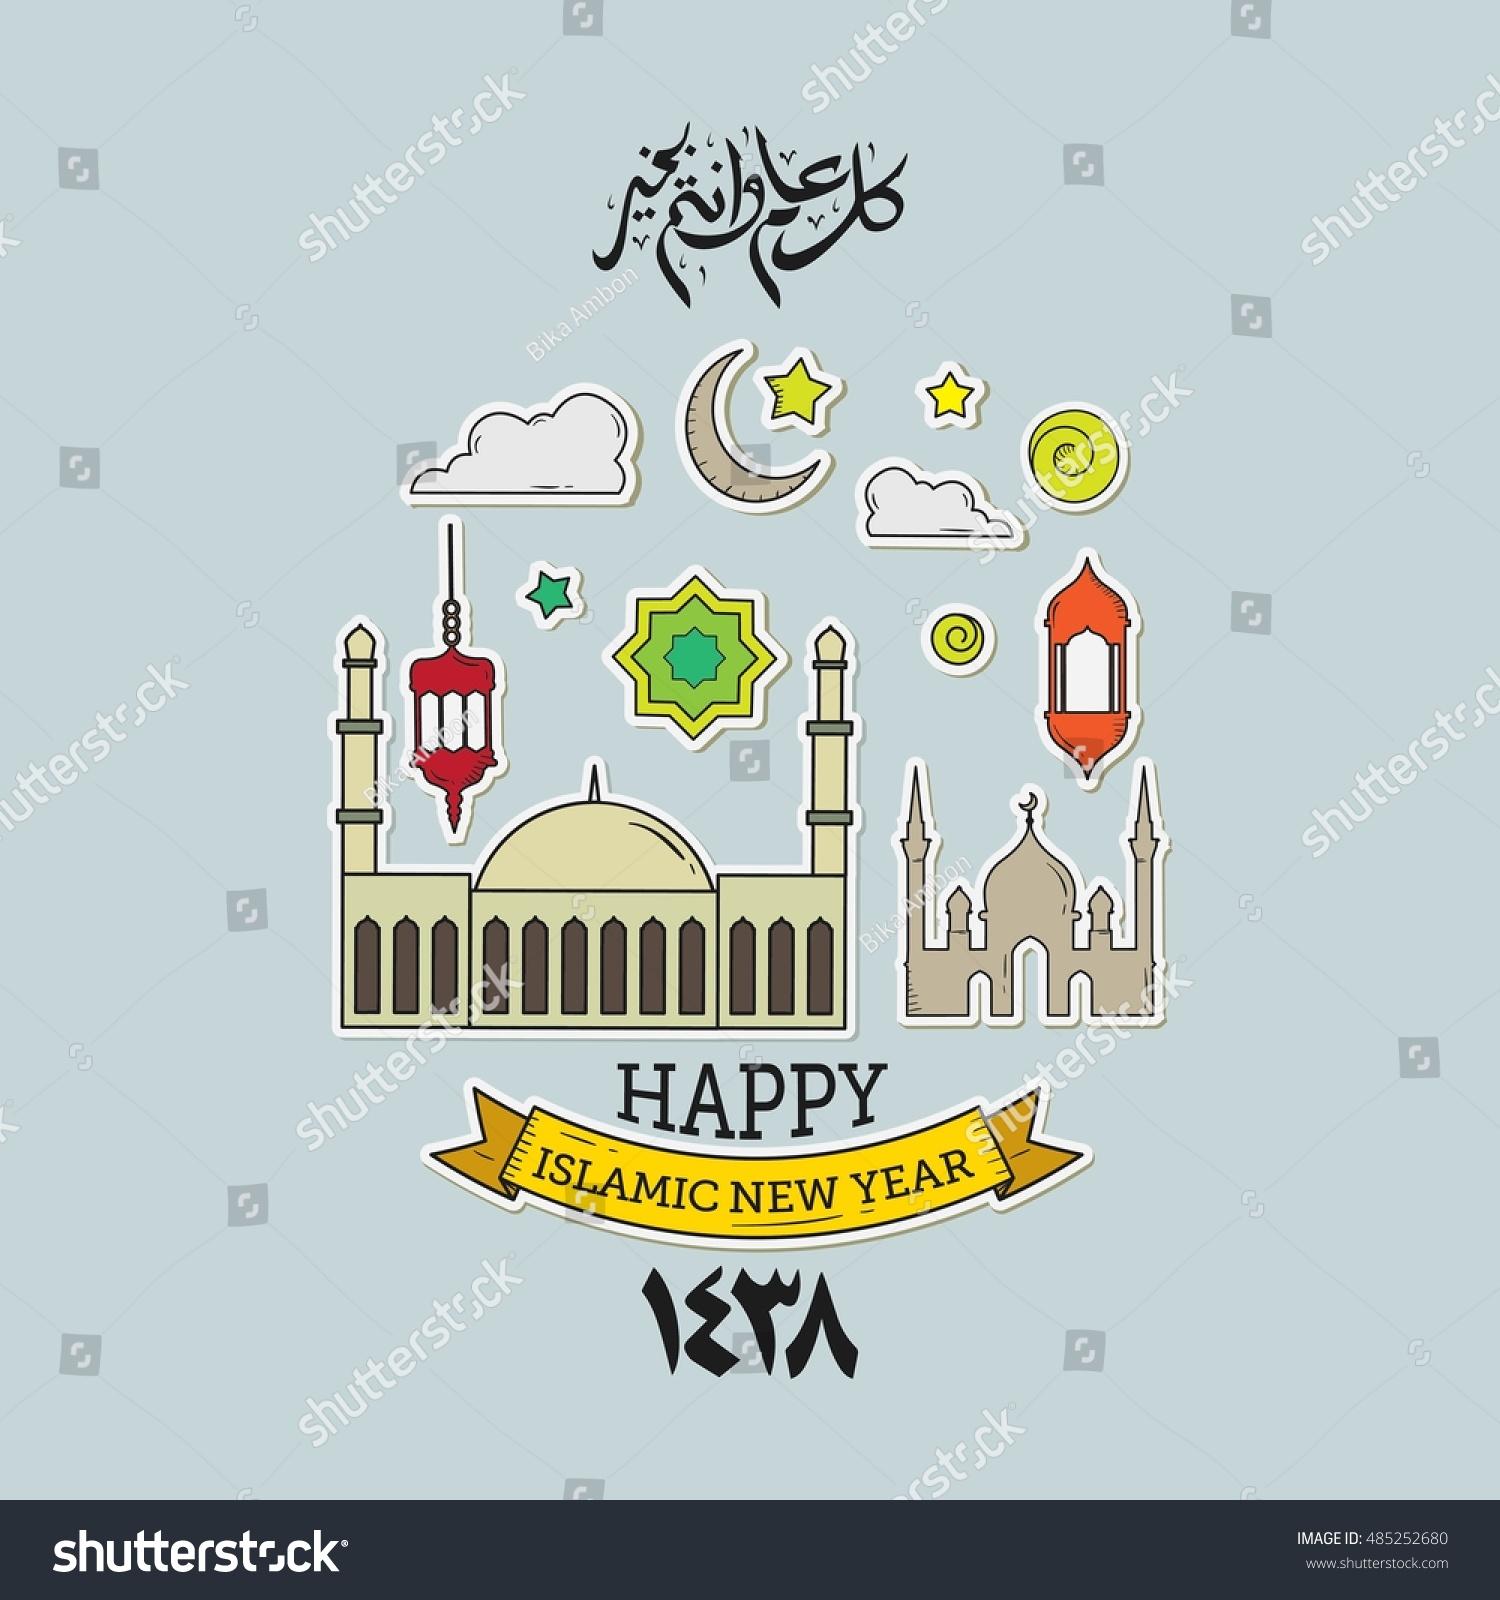 Happy new hijri year 1438 happy stock vector 485252680 shutterstock happy new hijri year 1438 happy new year for all muslim community happy islamic kristyandbryce Images